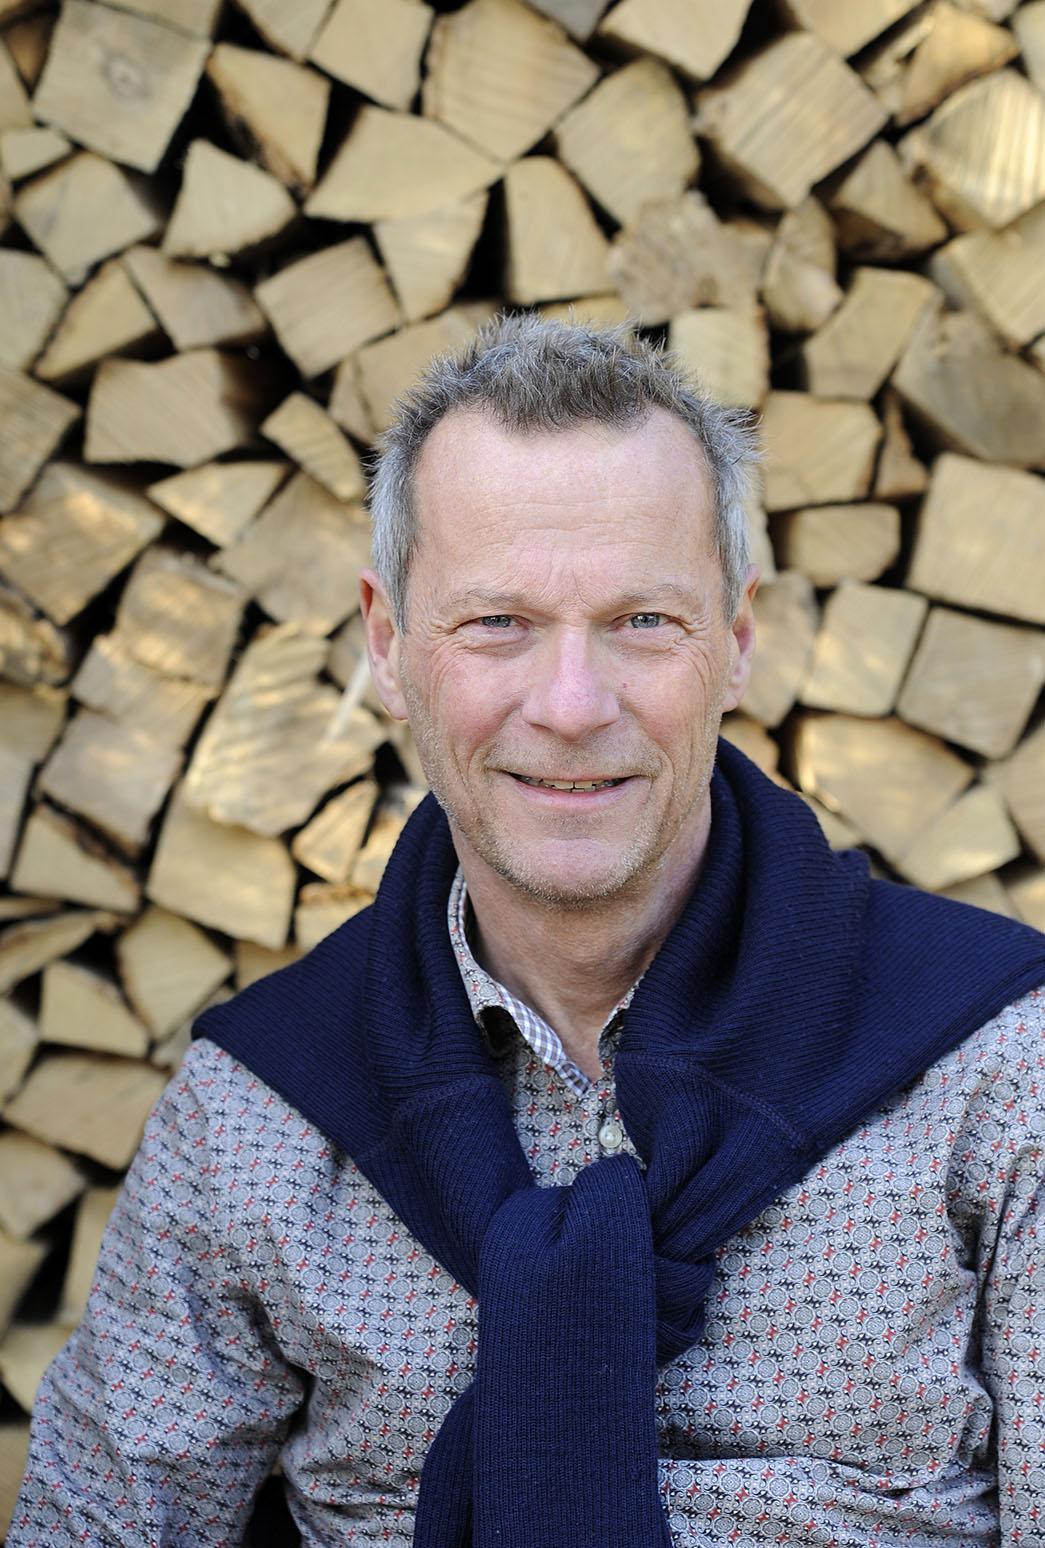 Morten Hartkorn Giraldi